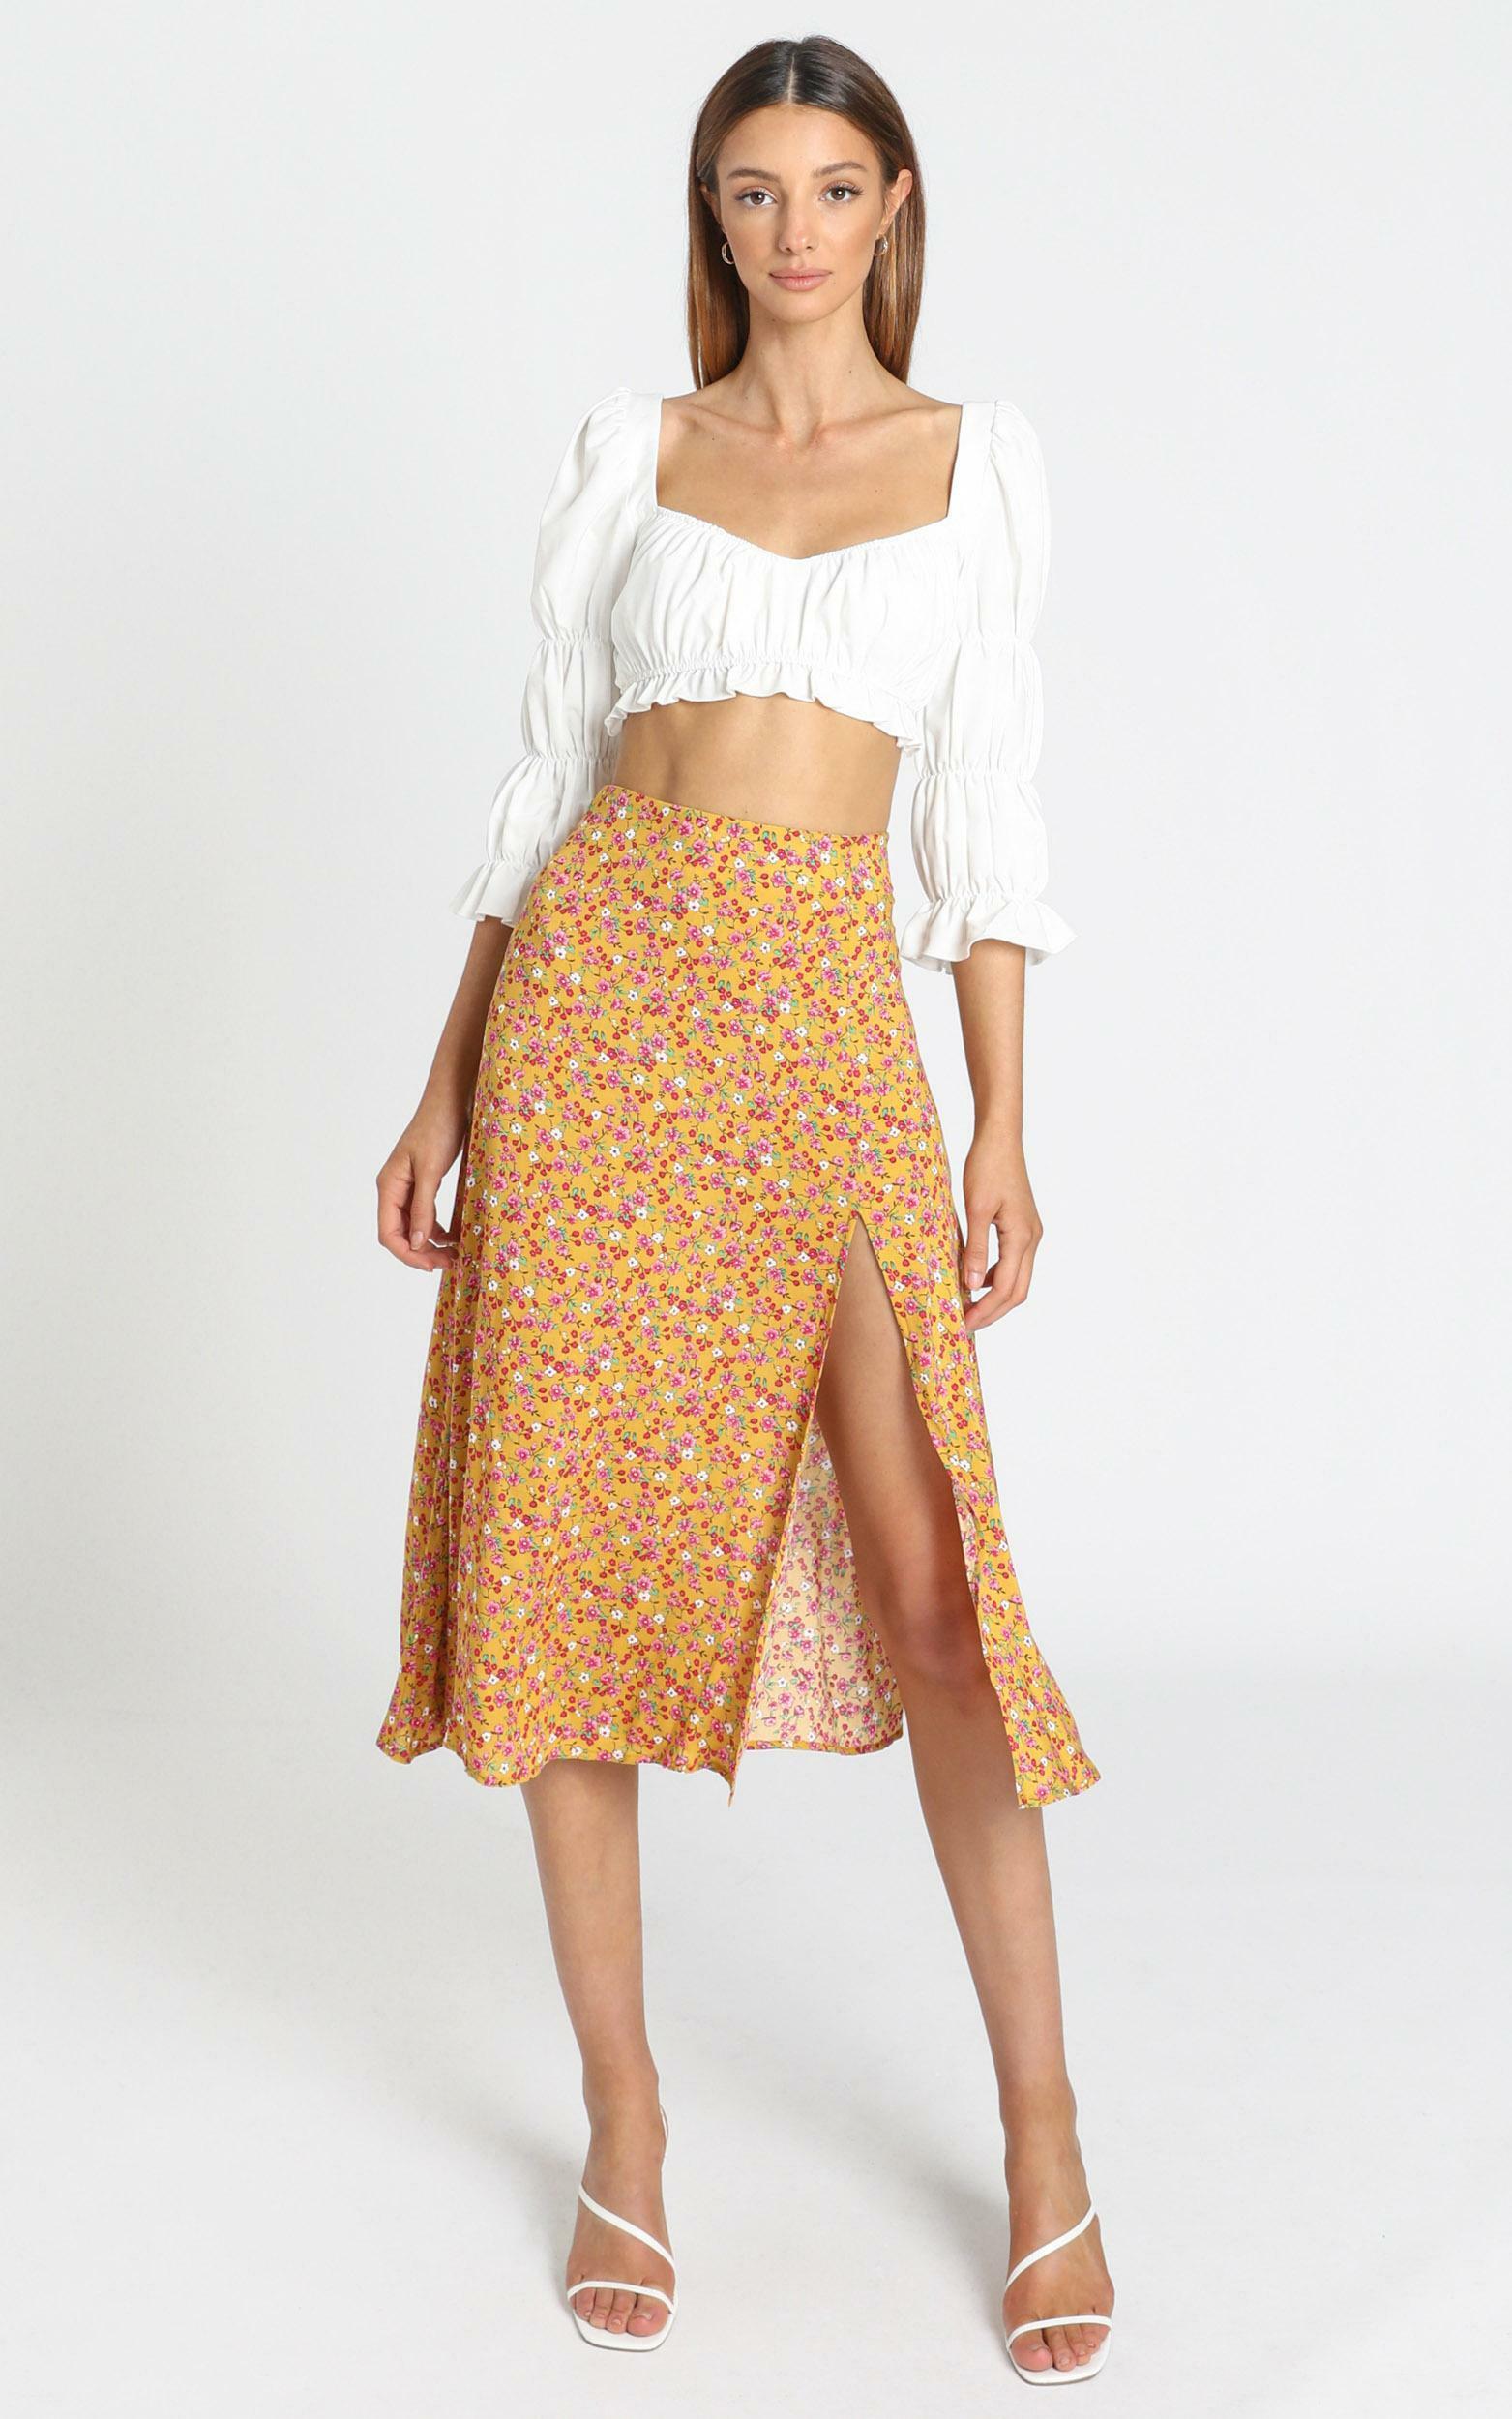 Kourtney Skirt in Mustard Floral - 06, YEL1, hi-res image number null